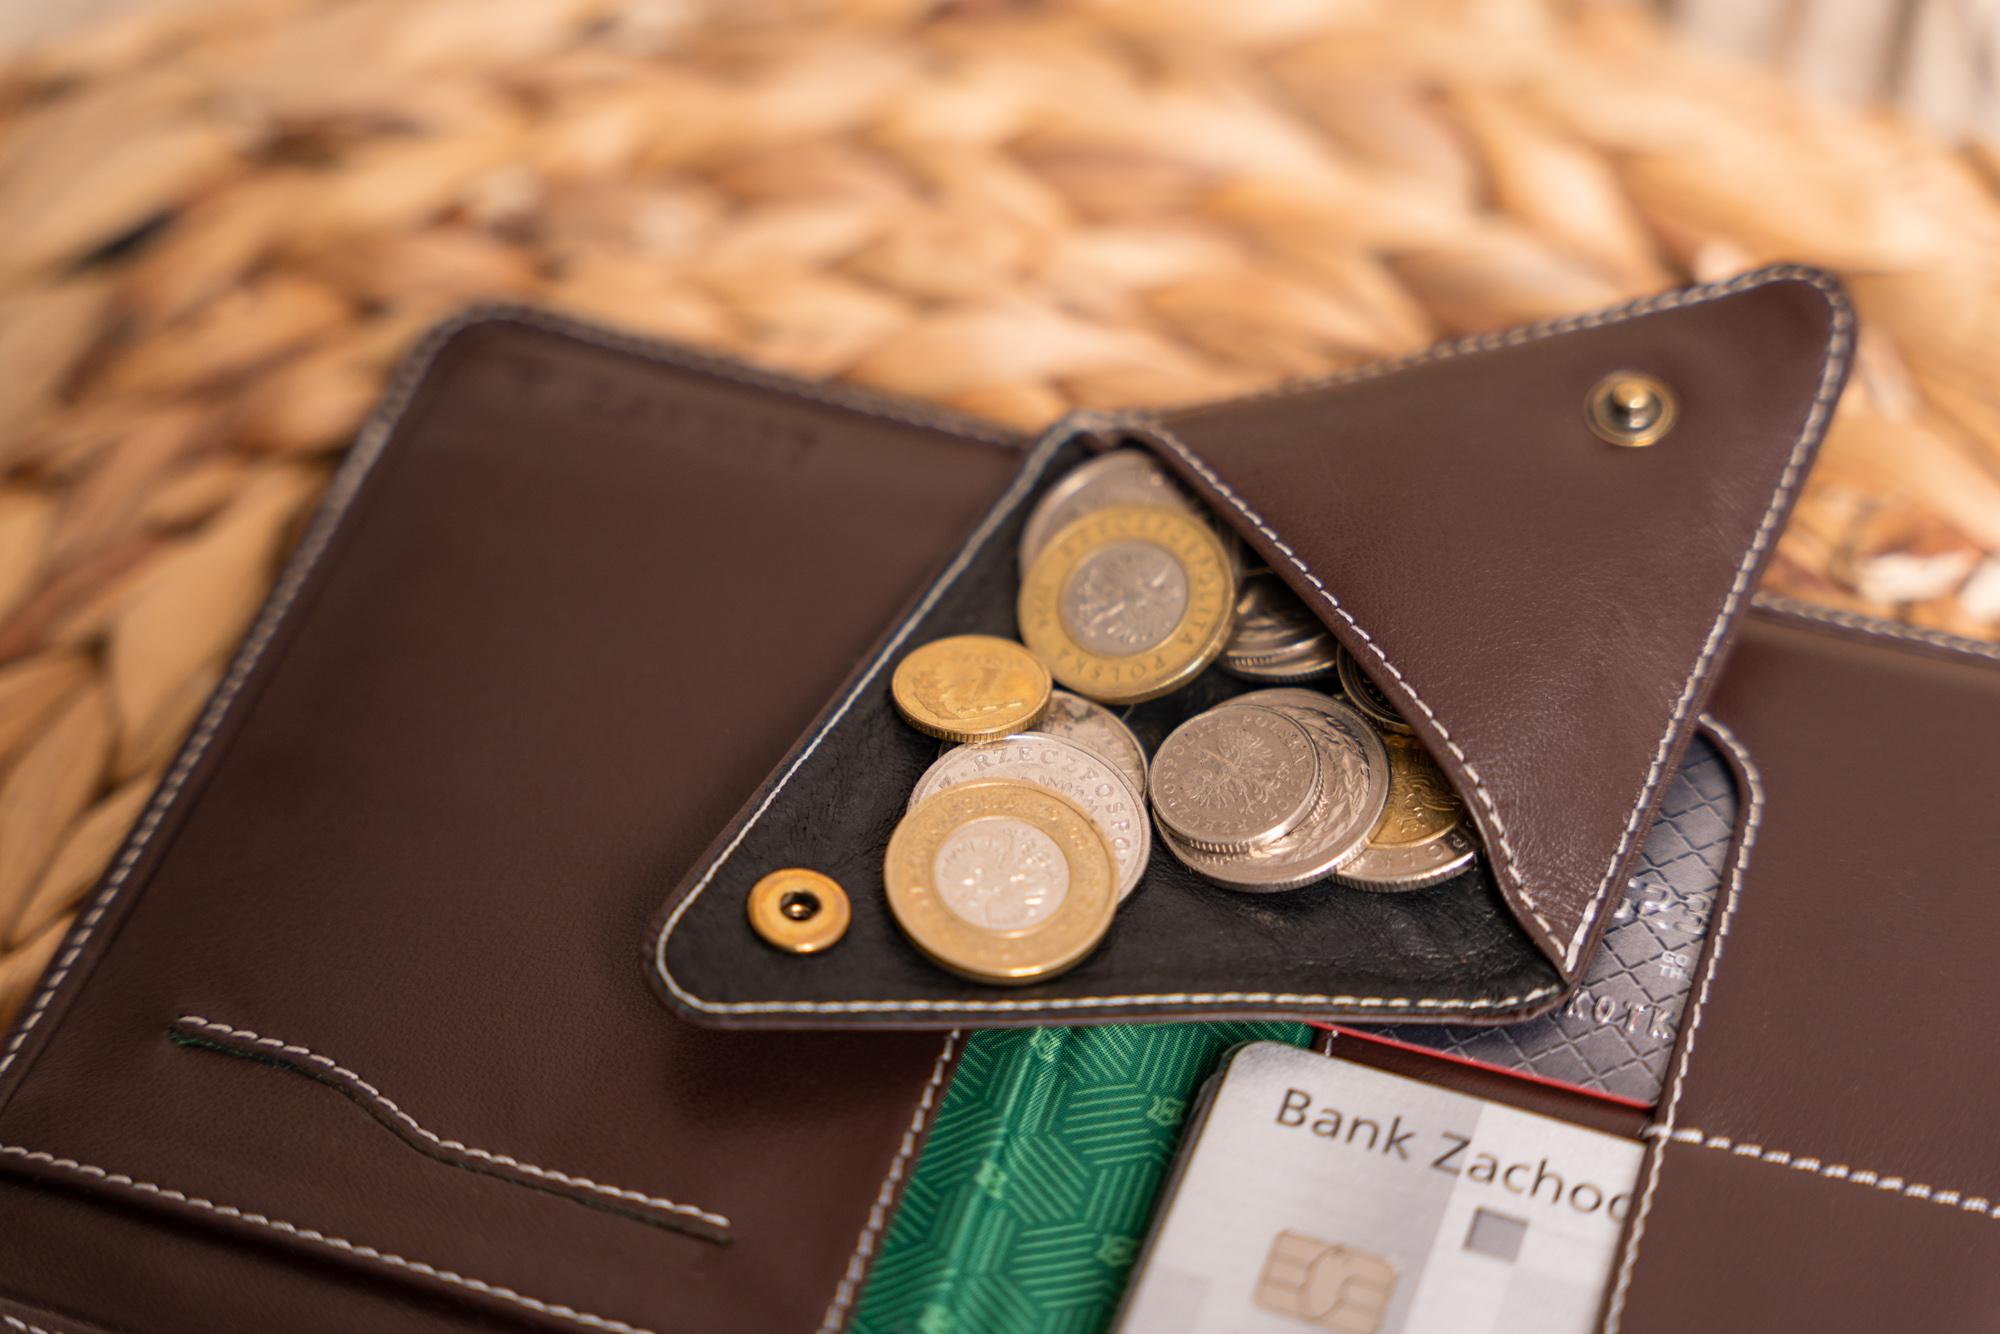 Manumi Daily Wallet opinie